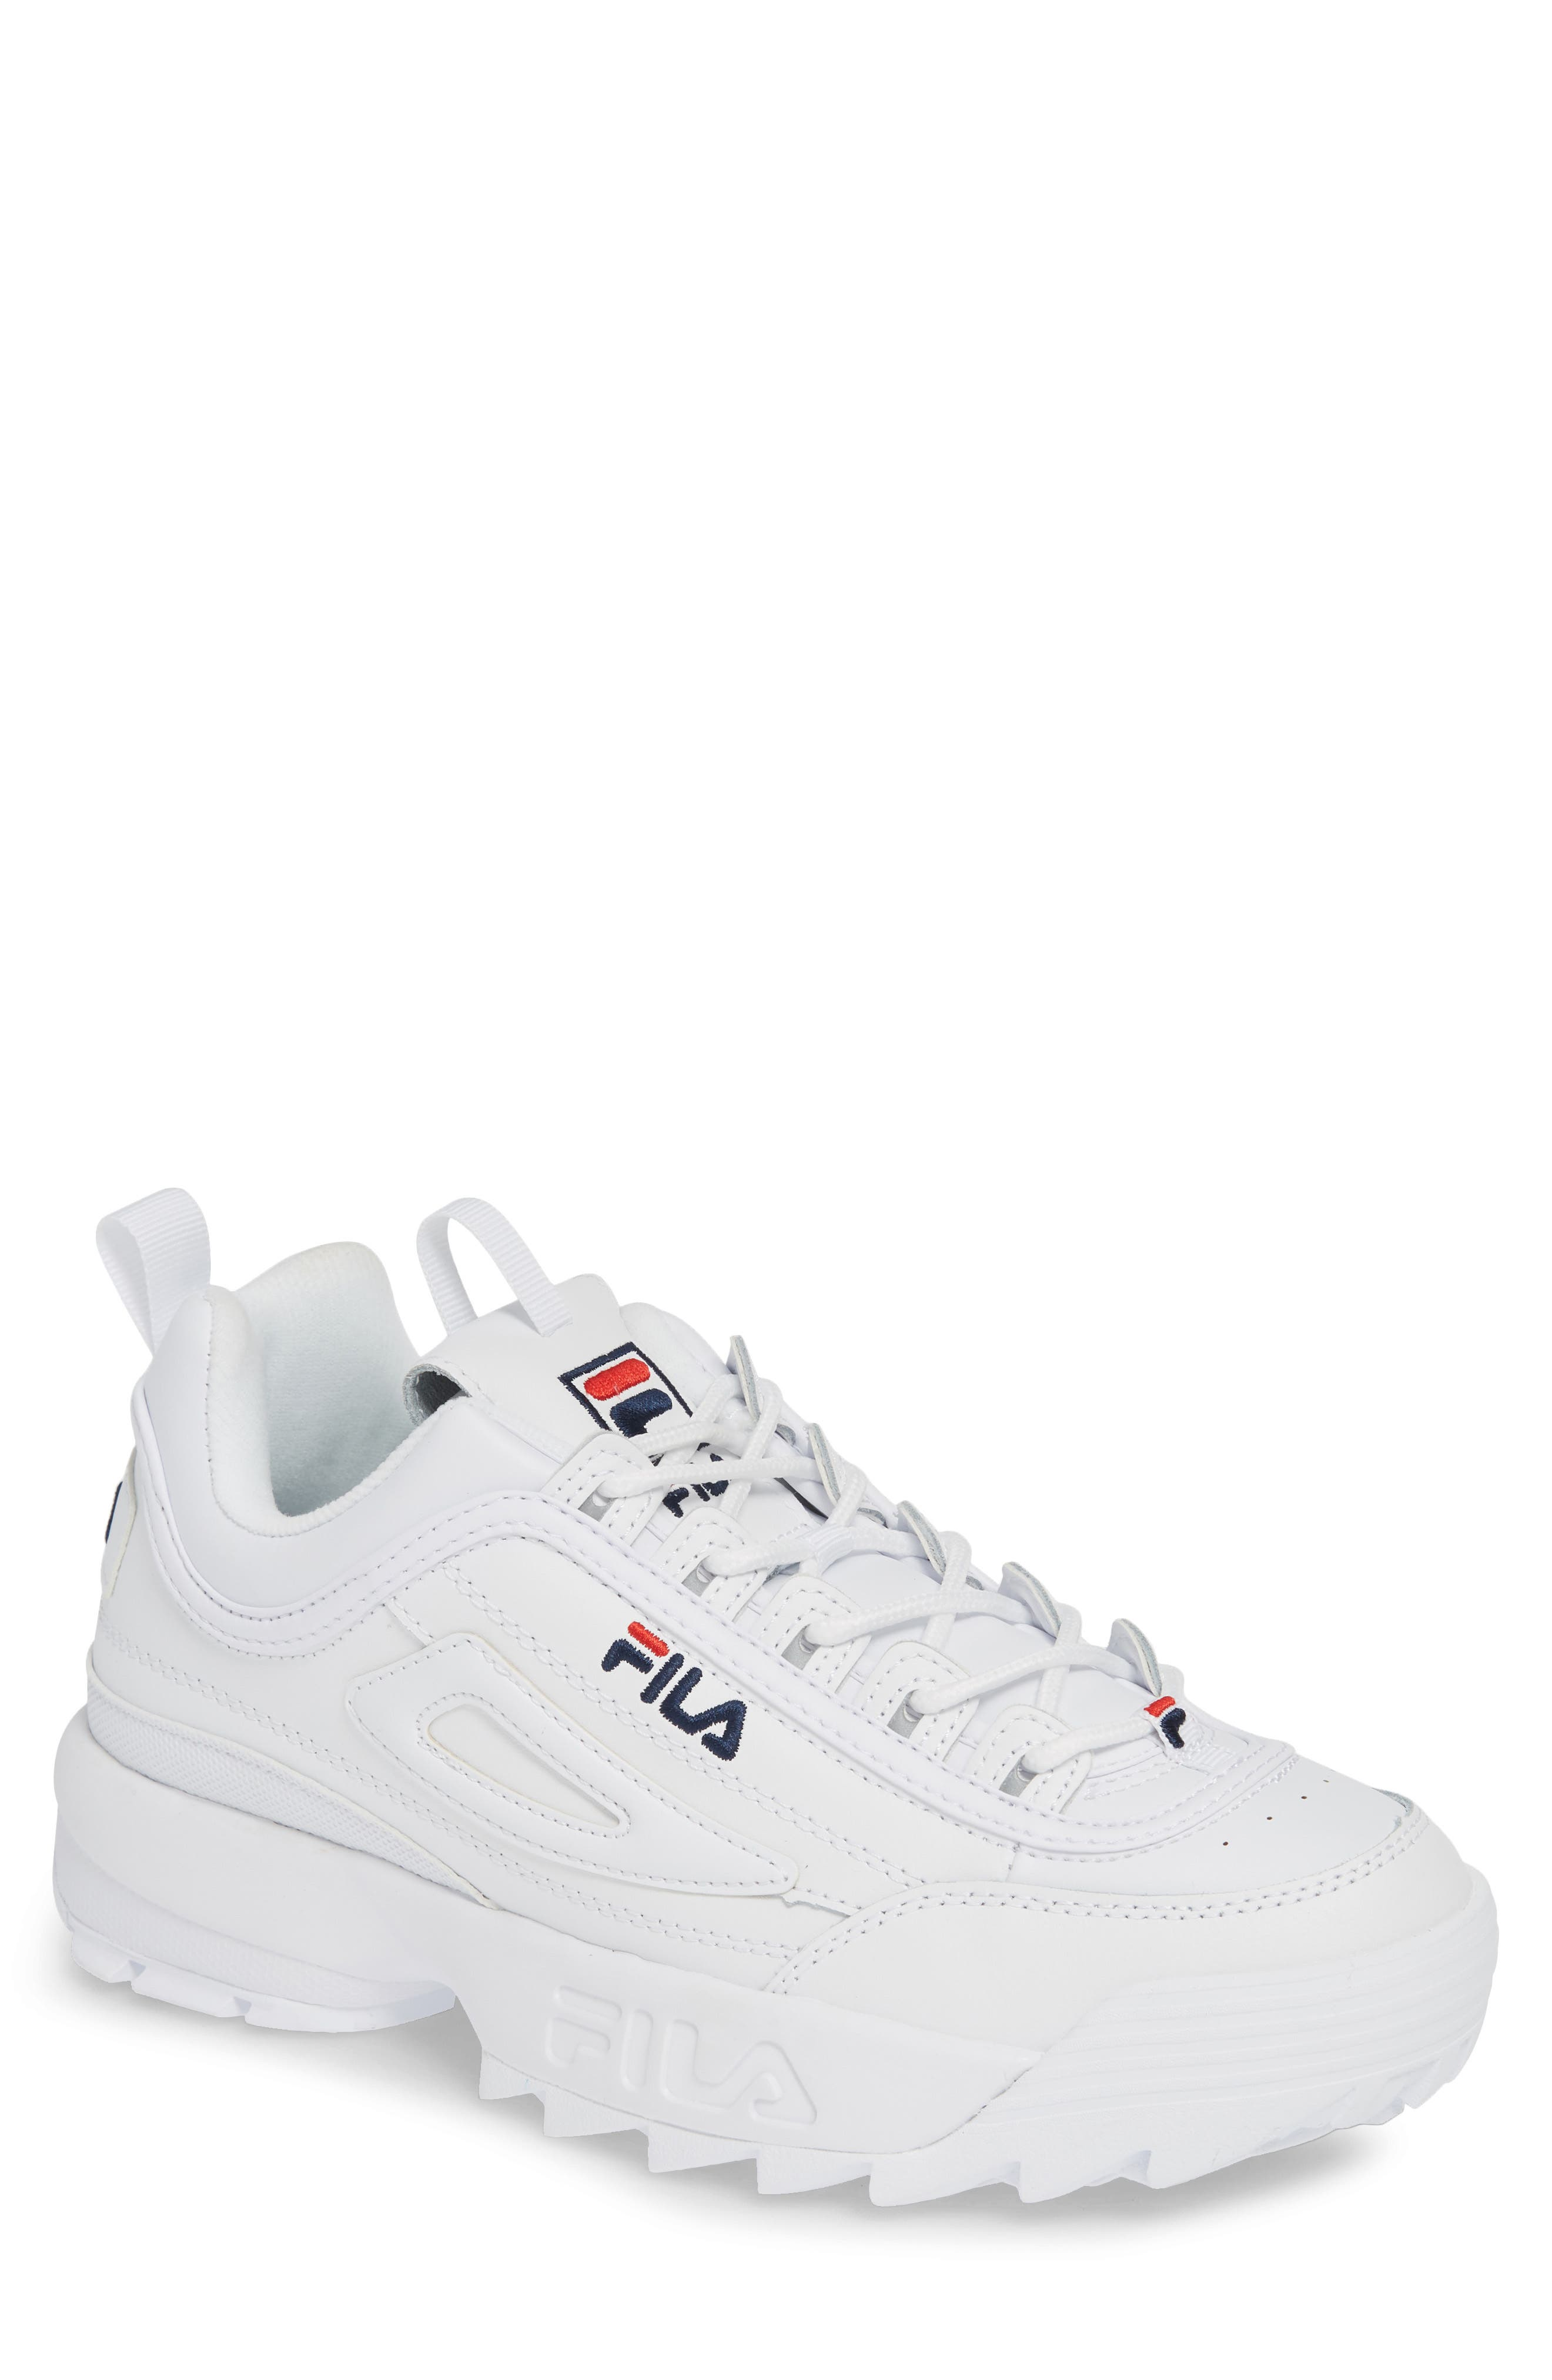 FILA, Disruptor II Premium Sneaker, Main thumbnail 1, color, WHITE/ NAVY/ RED